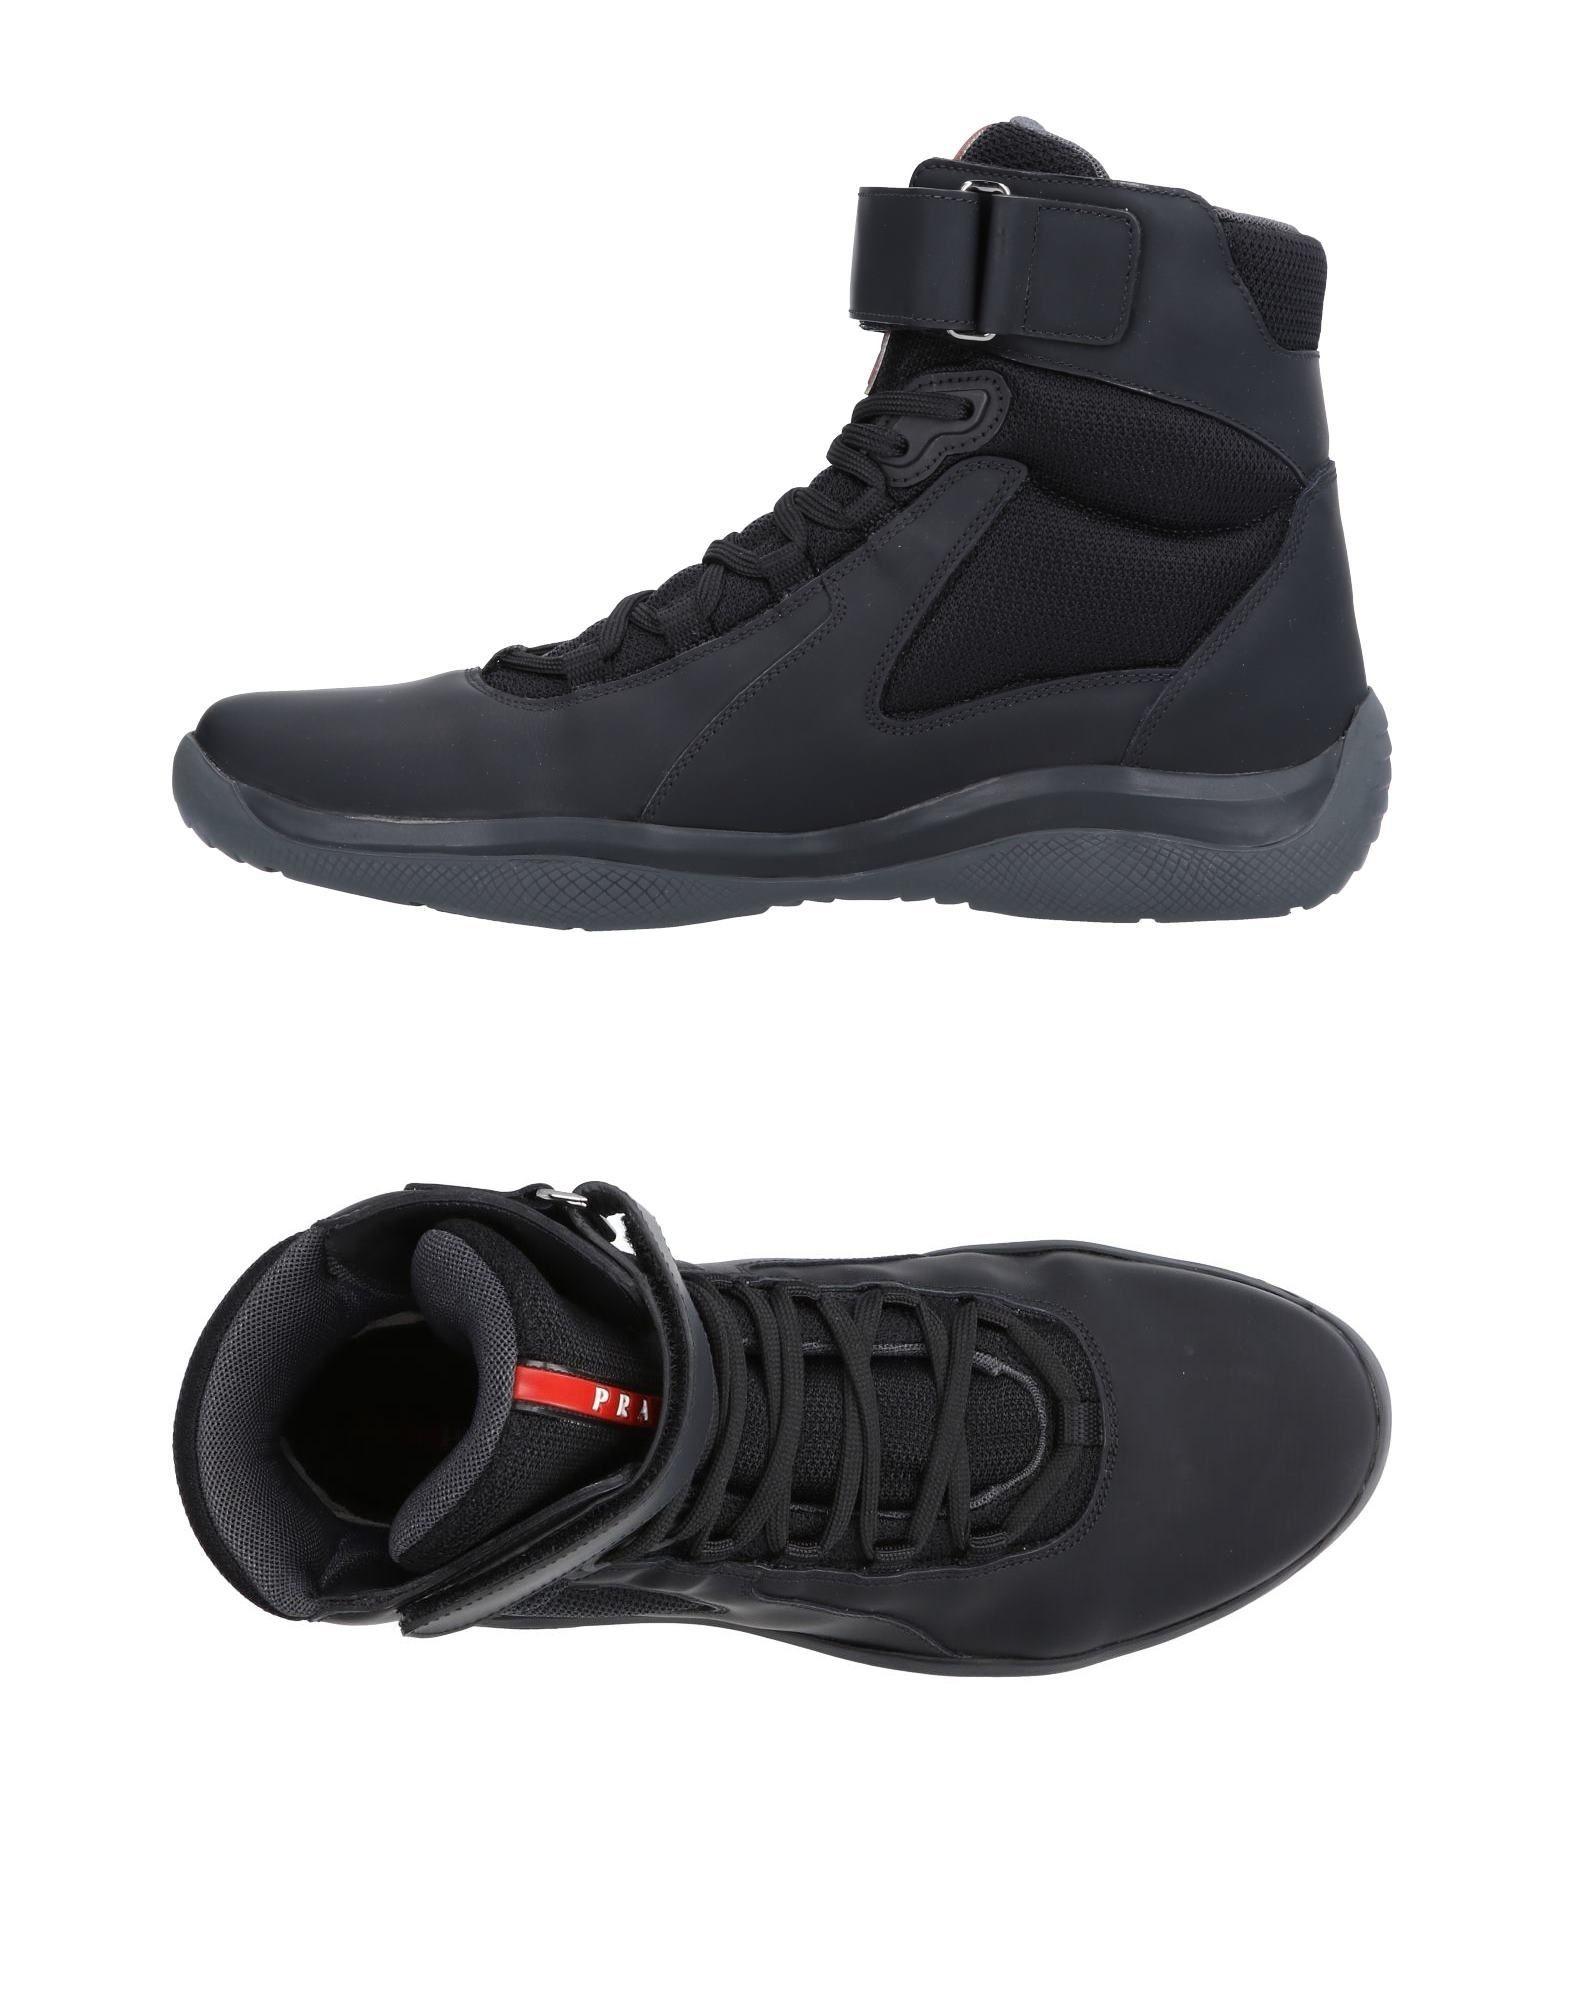 Prada Sport Sneakers Herren  11501977CC Gute Qualität beliebte Schuhe